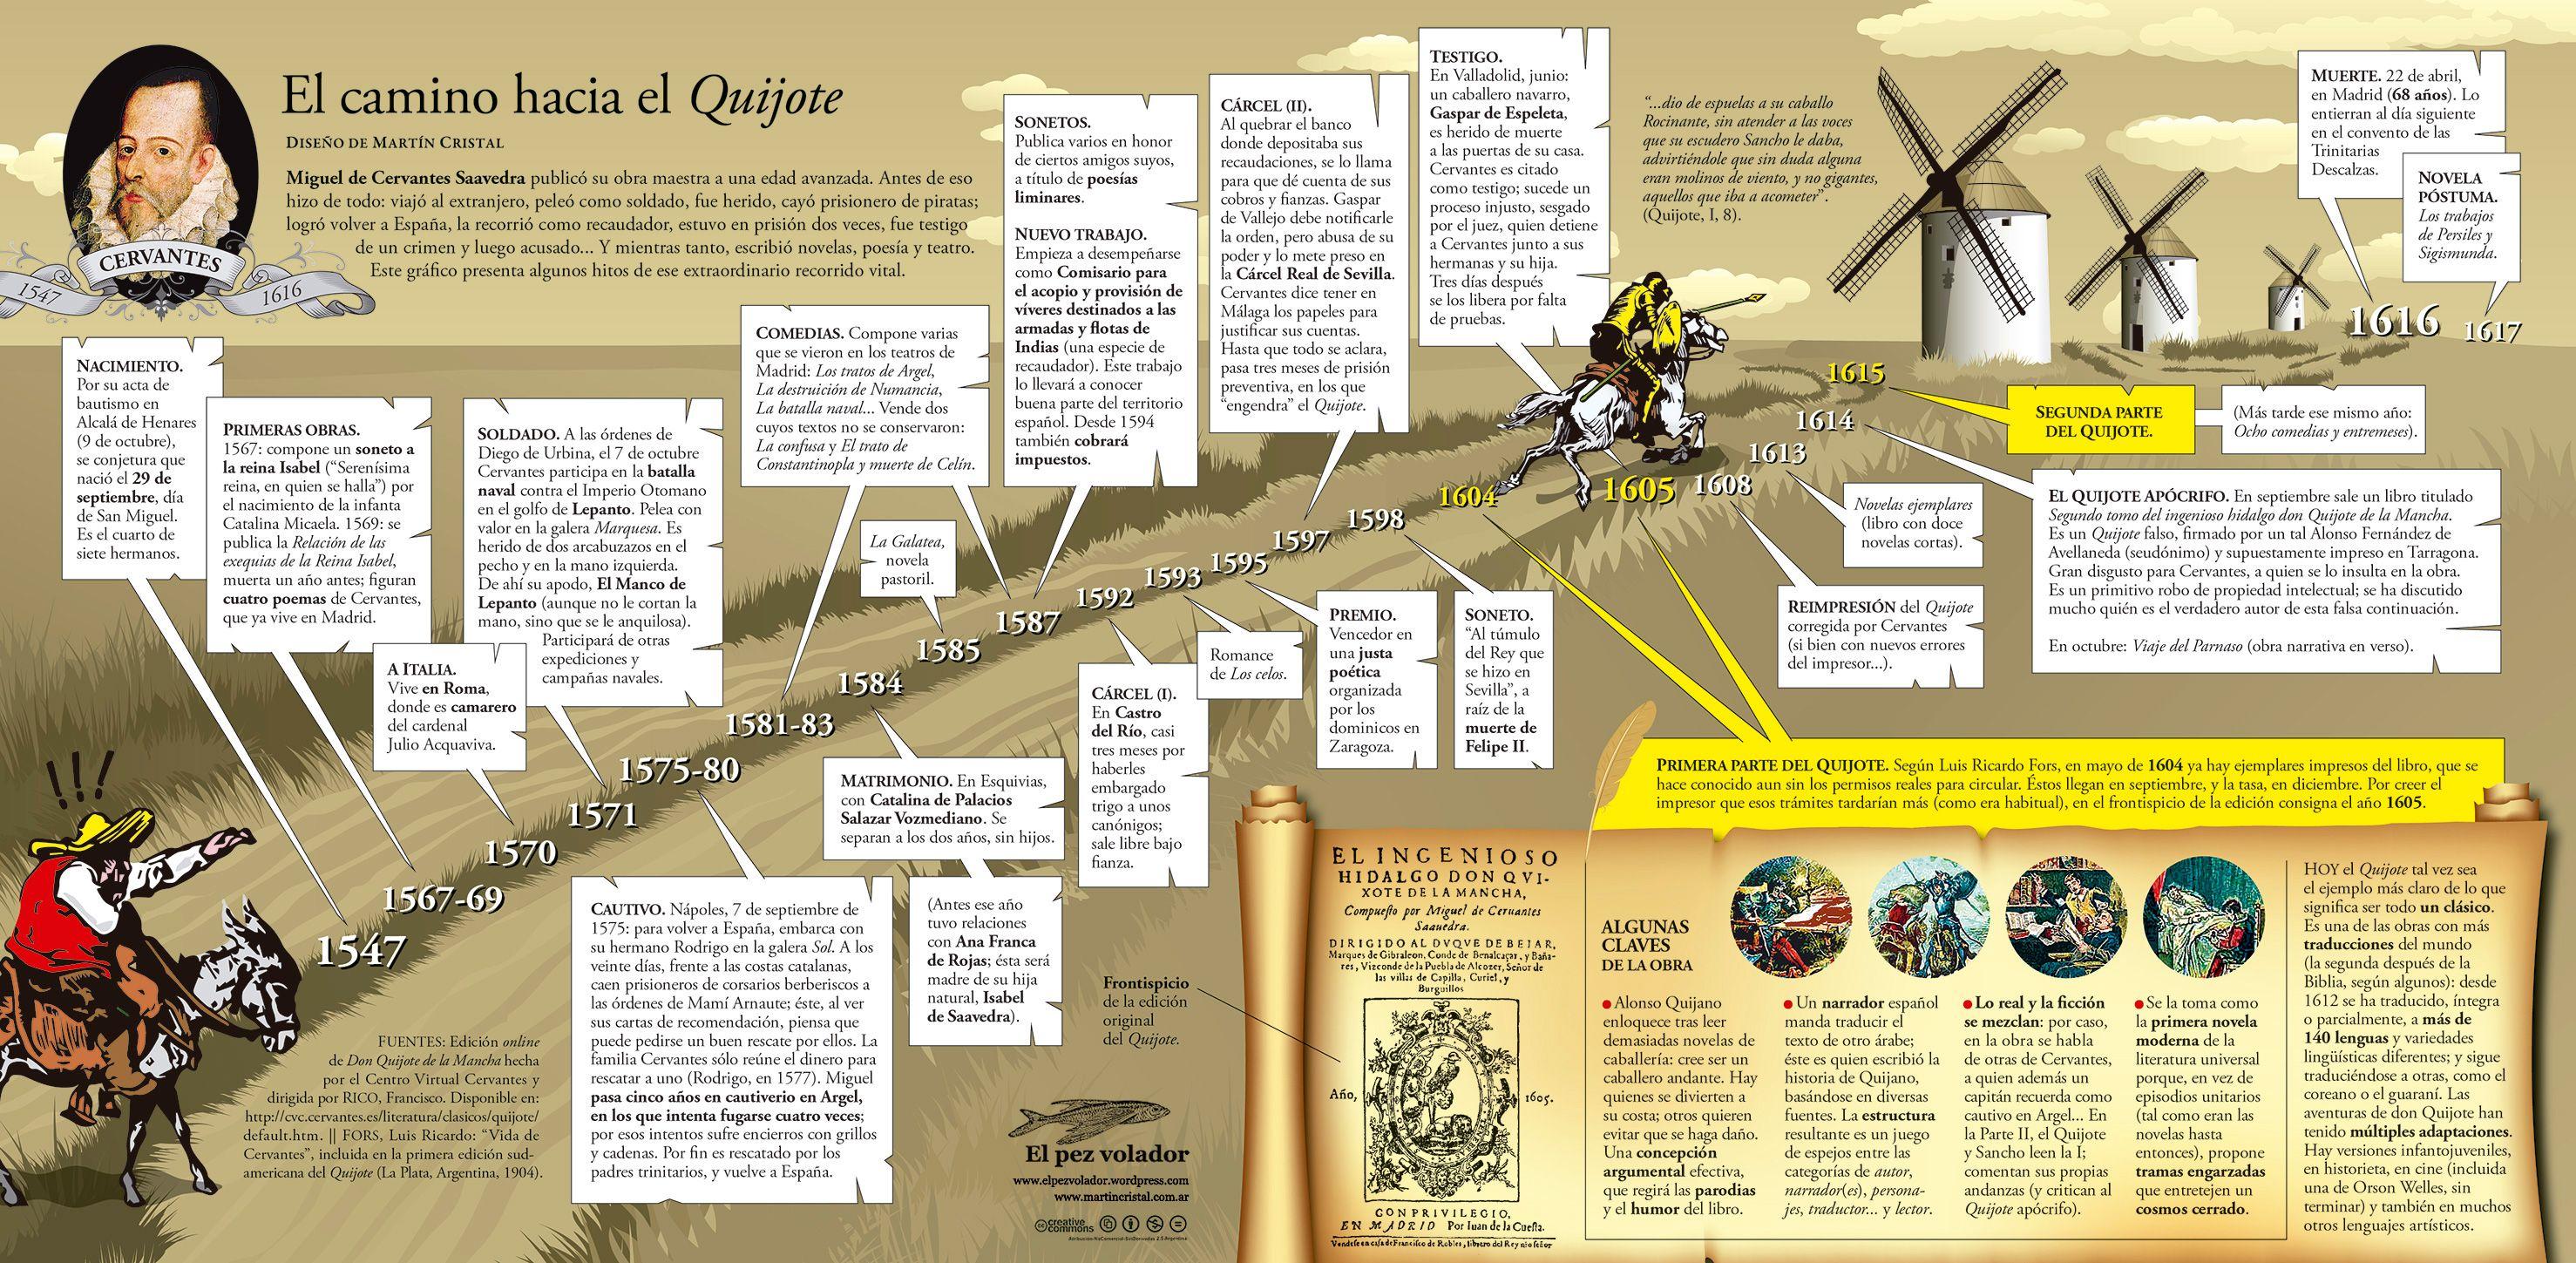 El Camino Hacia El Quijote Infografia